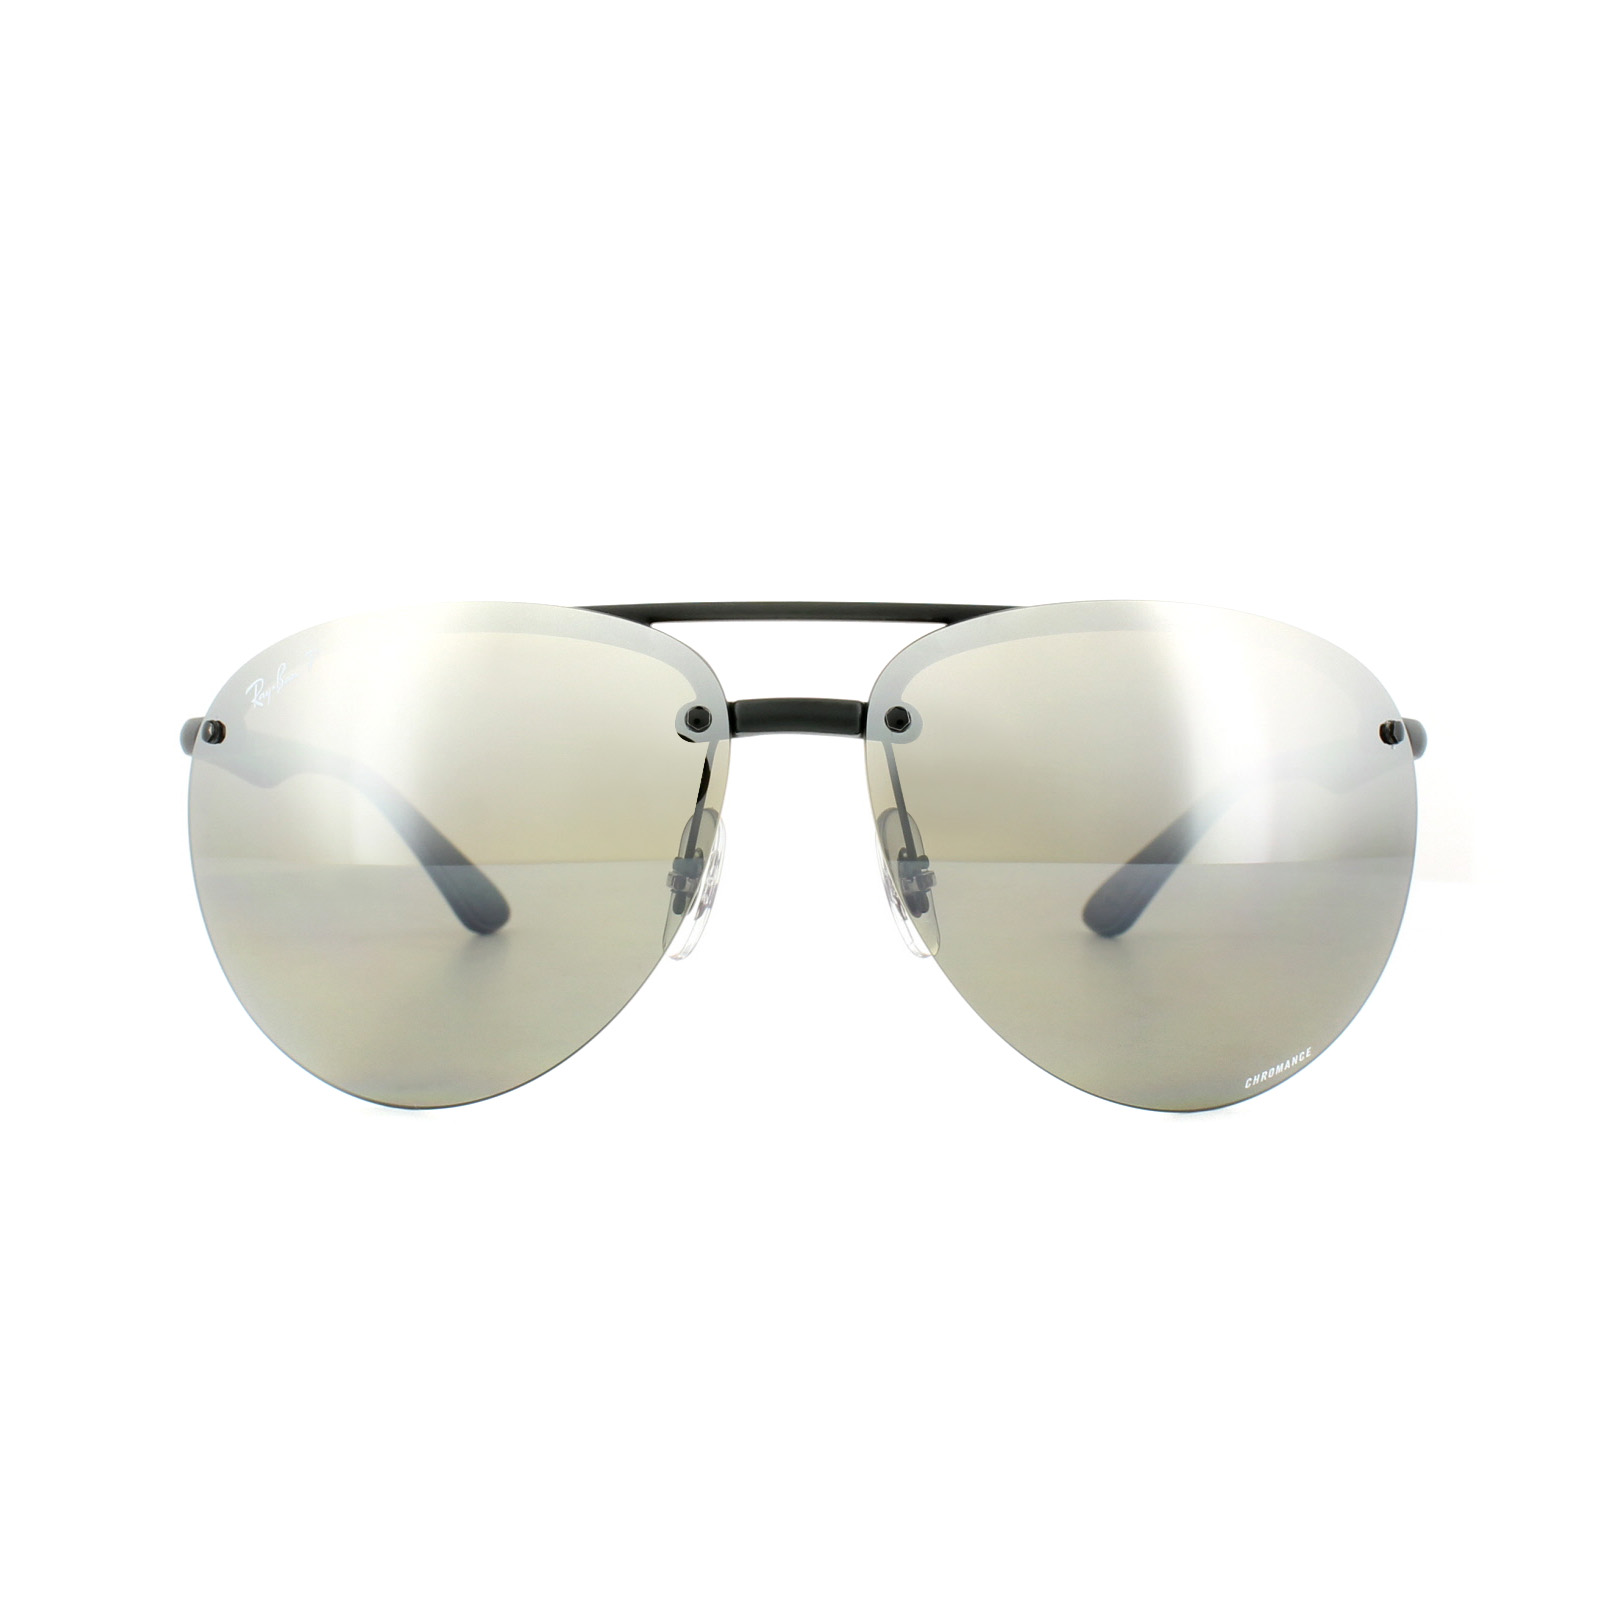 e6aa69723e4 Sentinel Ray-Ban Sunglasses 4293CH 601S5J Black Polarized Silver Mirror  Chromance